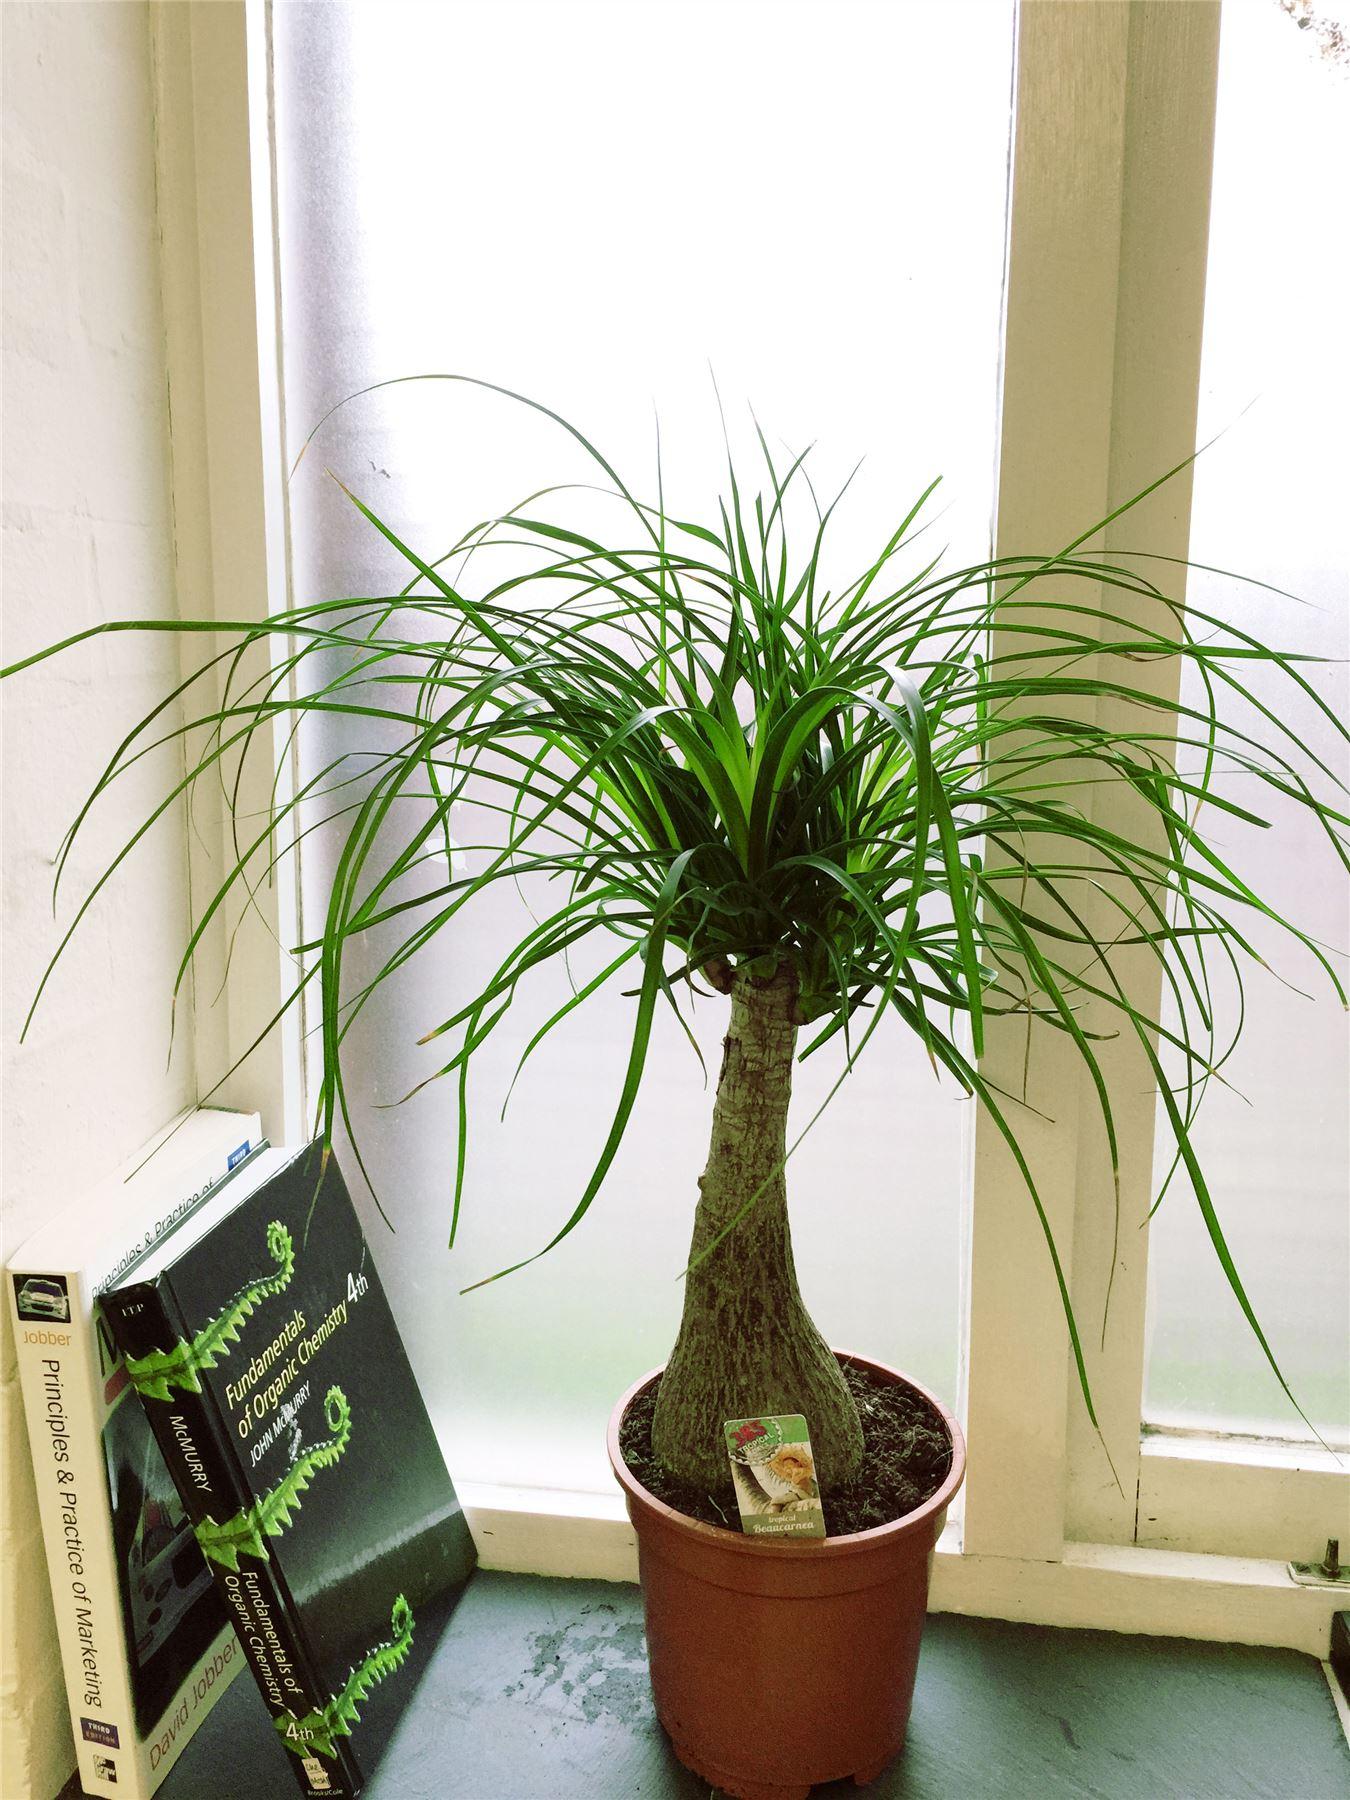 Pony Tail Elephants Foot Tree Palm Beaucarnea Recurvata